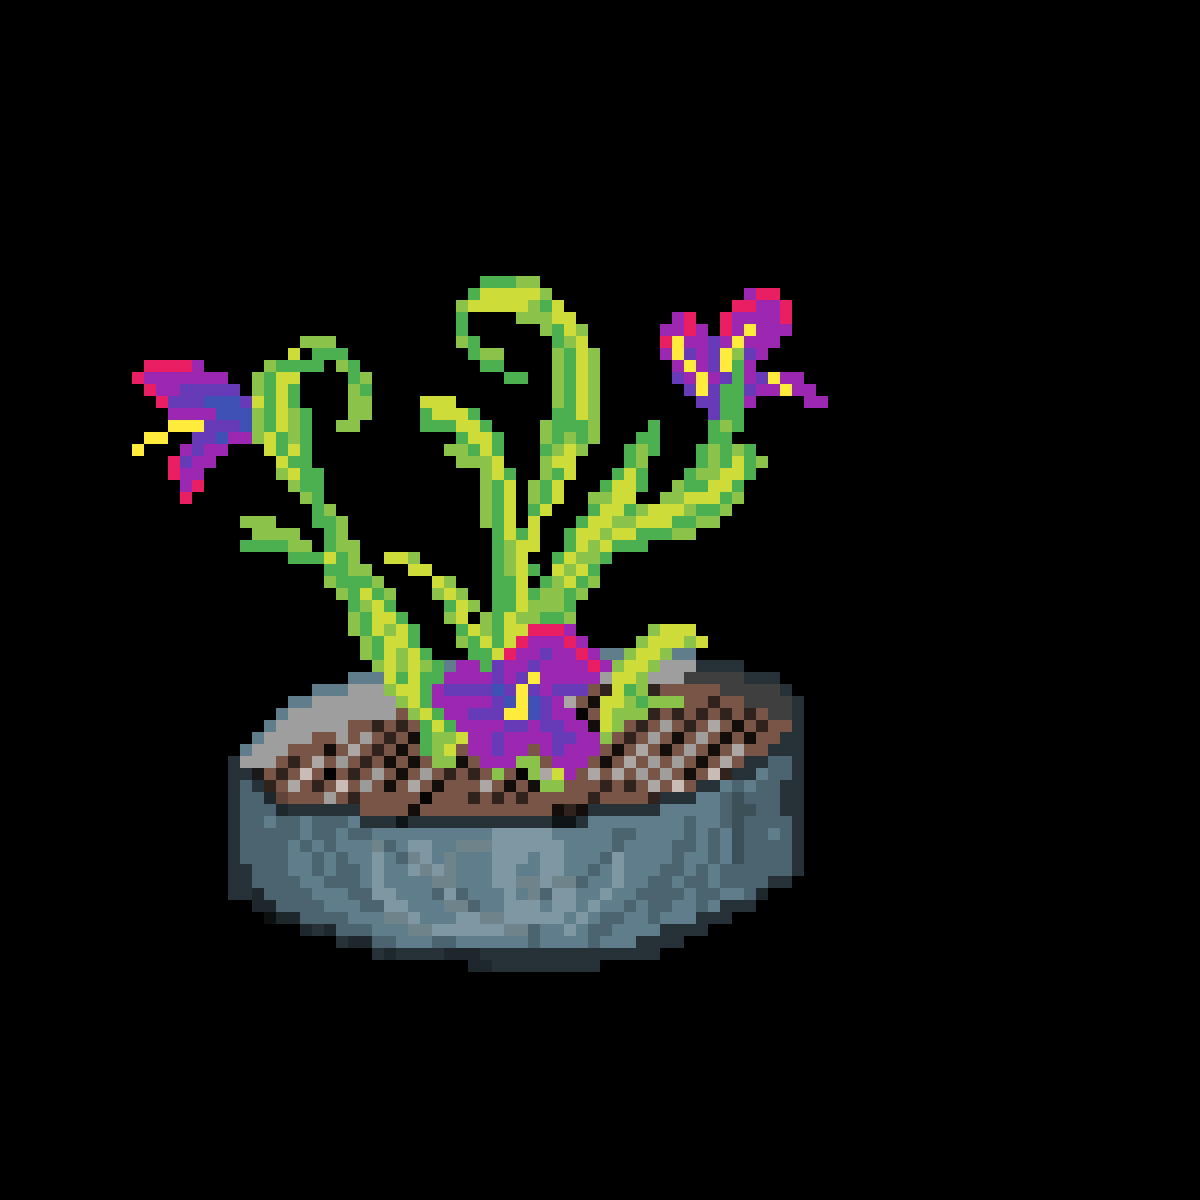 An Abstract flower